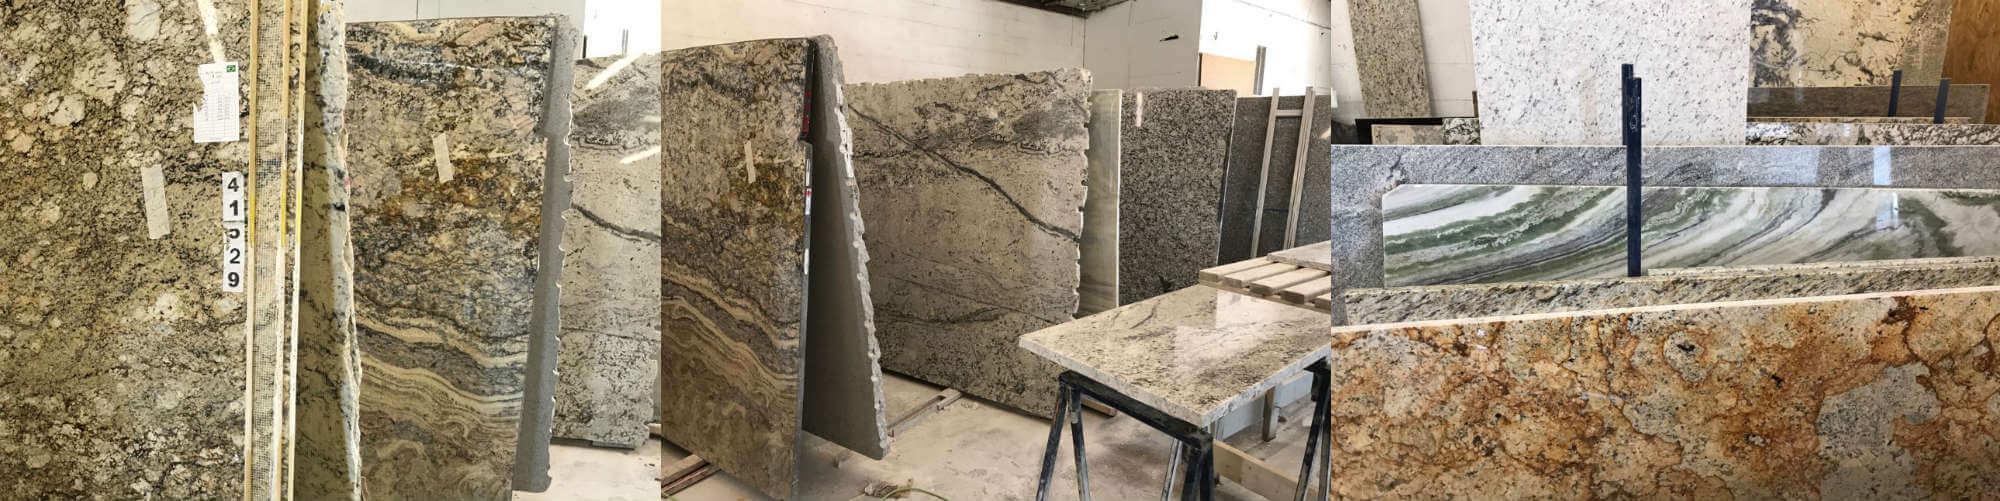 Best Granite Countertops In Cleveland